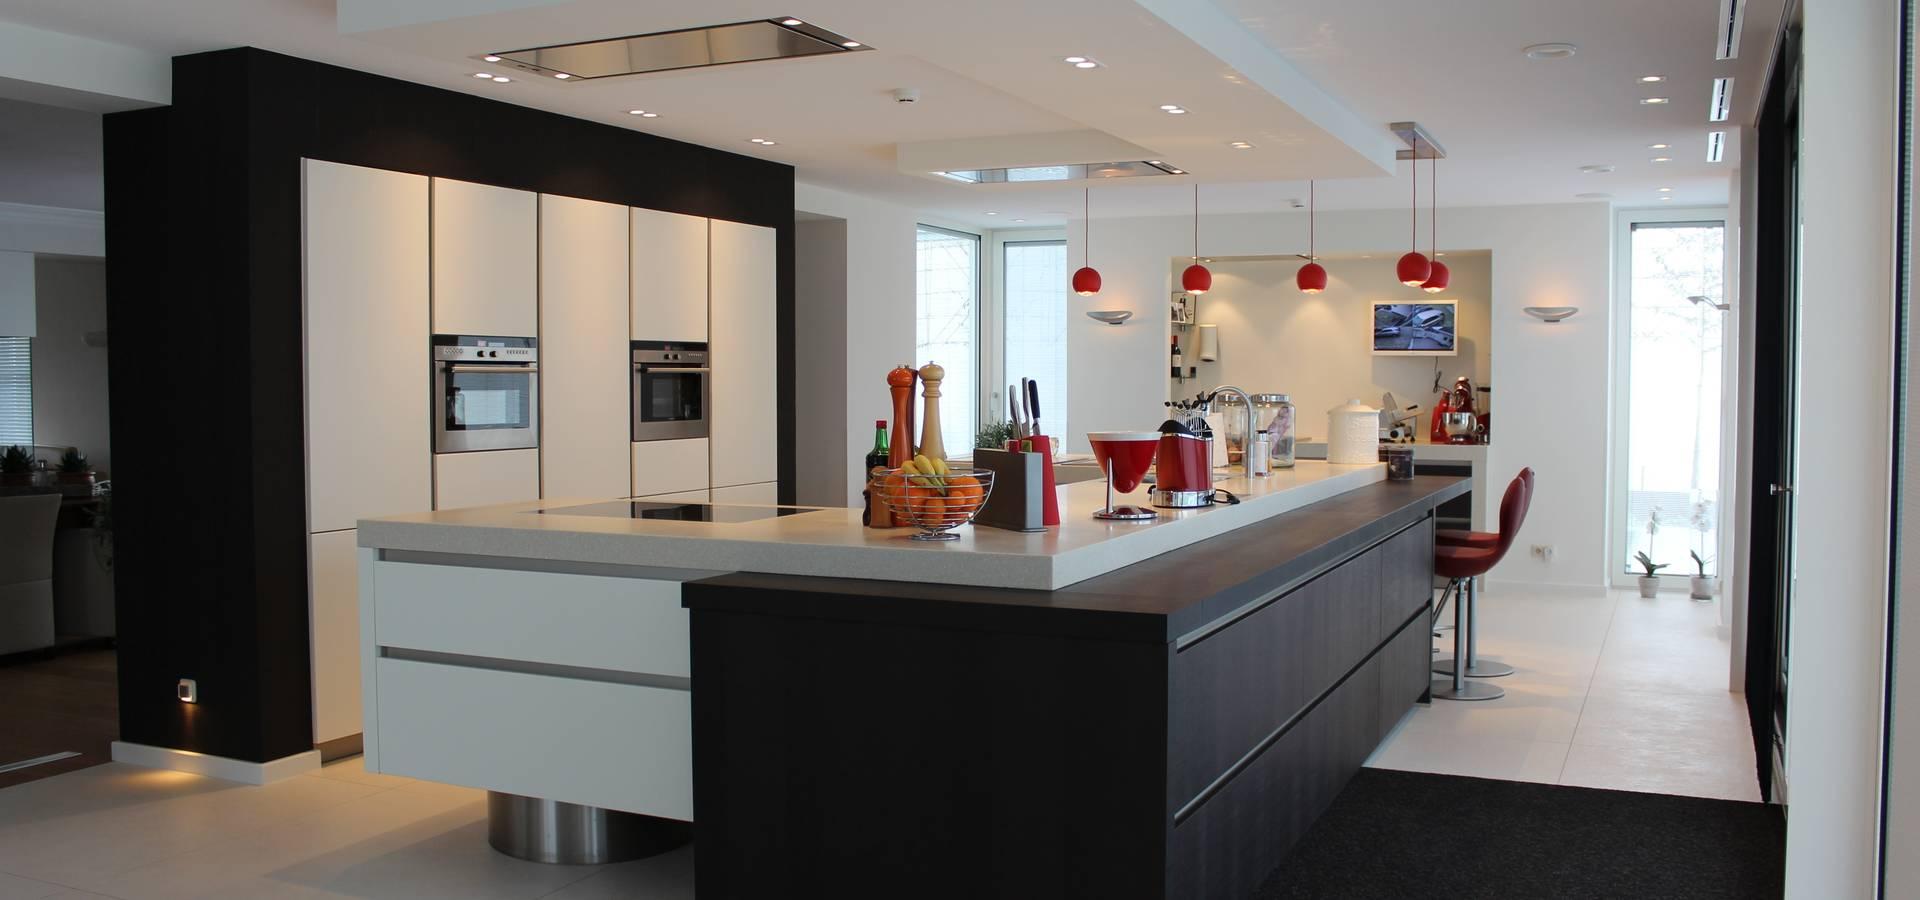 Tinnemans Keukens